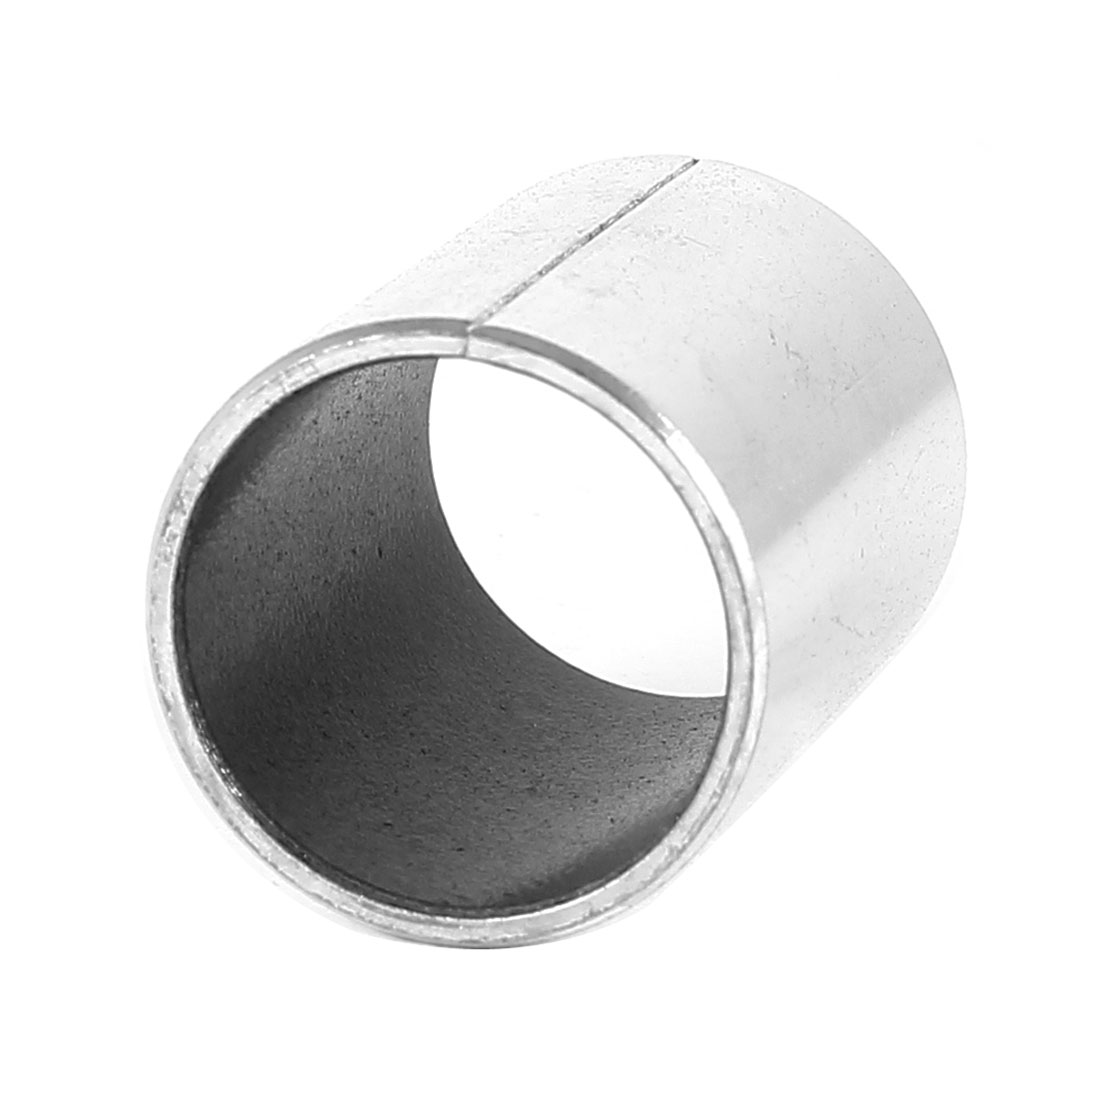 Silver Tone Self Lubricating Metal Plain Bearing Sleeve 30mm x 23mm x 20mm